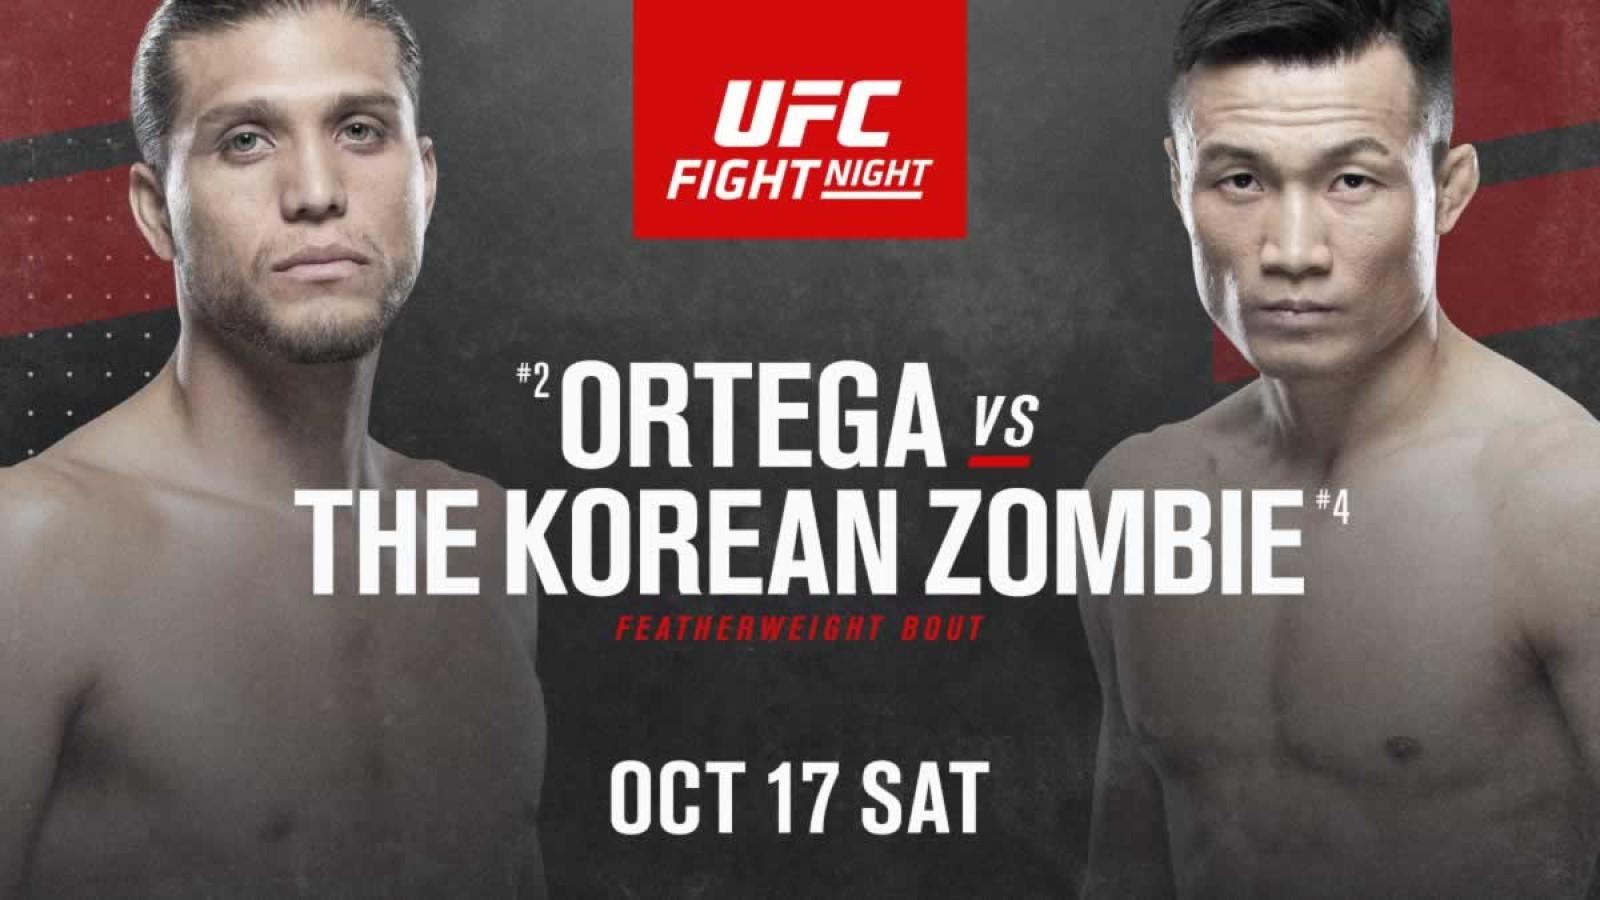 Ufc Fight Night Ortega Vs The Korean Zombie Fight Card How To Watch Technadu